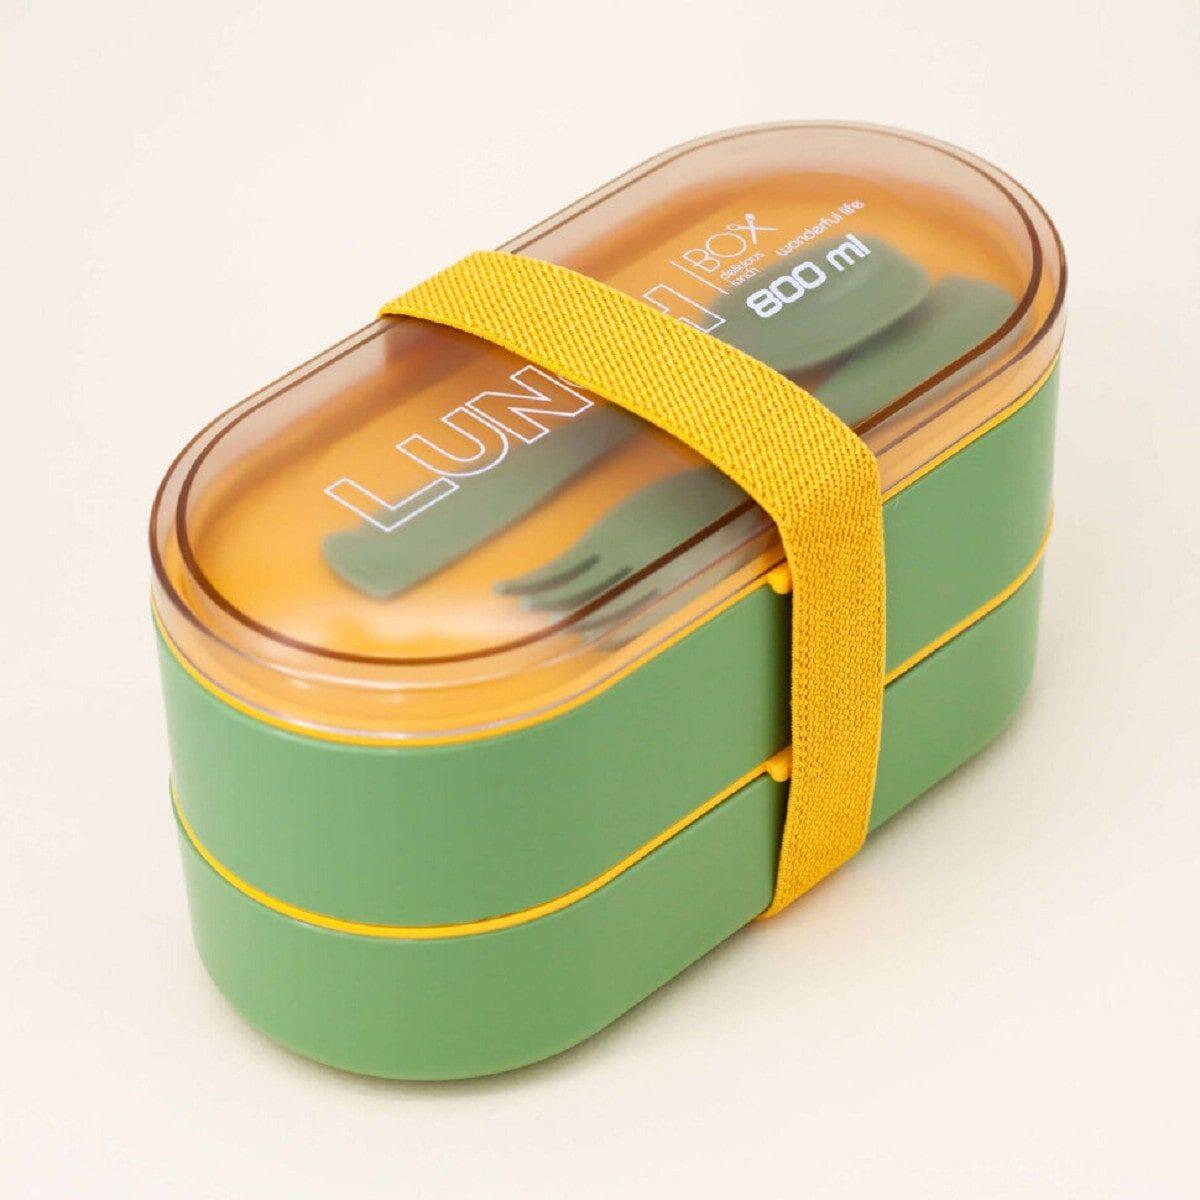 Ланчбокс бенто на 2 рівні з ложкою та виделкою 900 мл, зелено-жовтий